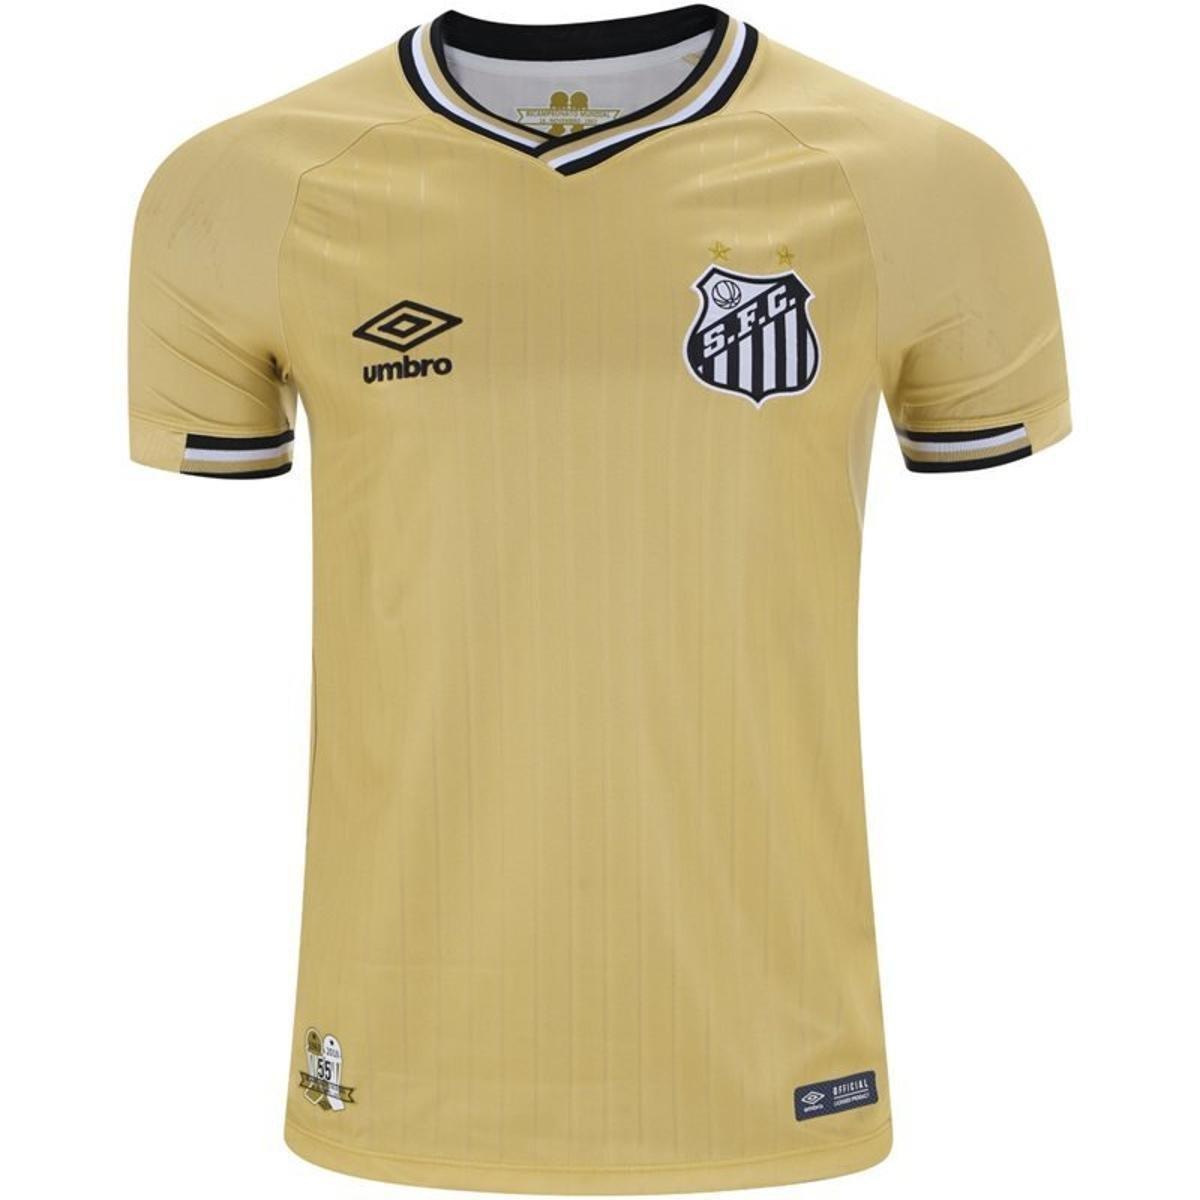 2f5f169aa5 Camisa Umbro Santos 2018 Masculina - Dourado e Preto | Netshoes